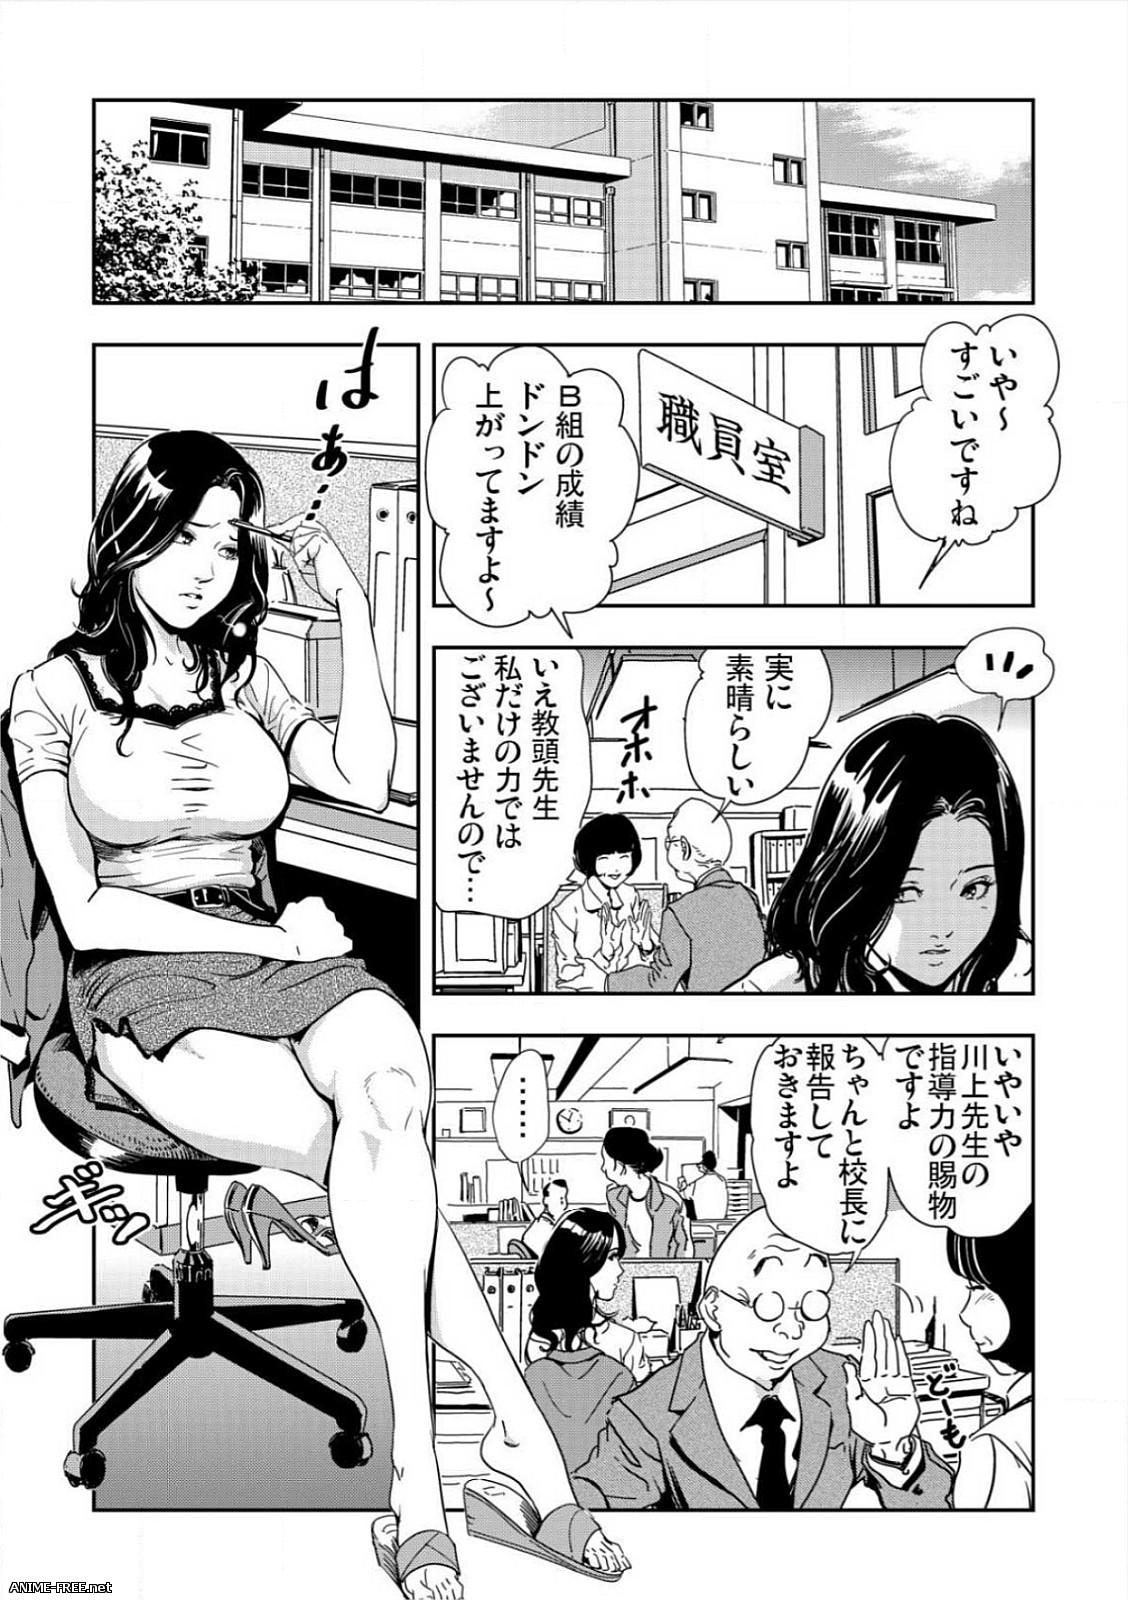 Misaki Yukihiro (Collection) / Сборник хентай манги [Cen] [JAP,ENG,GHI] Manga Hentai